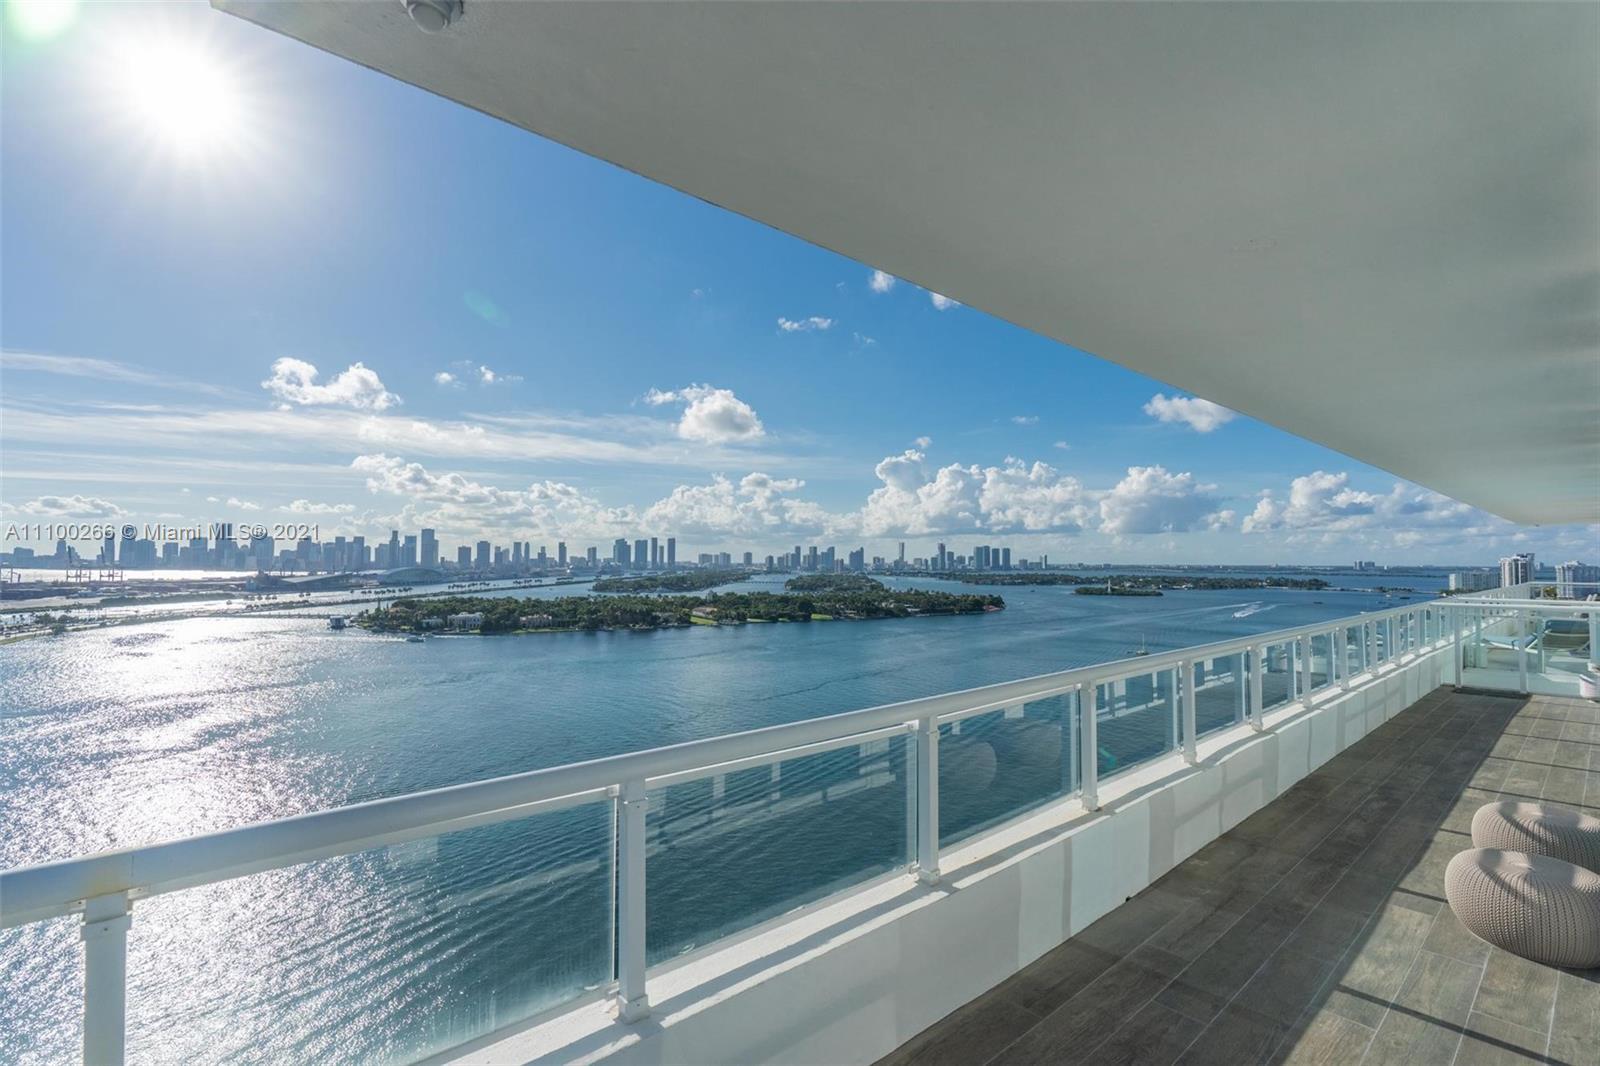 520 West Ave Unit 2201, Miami Beach, Florida 33139